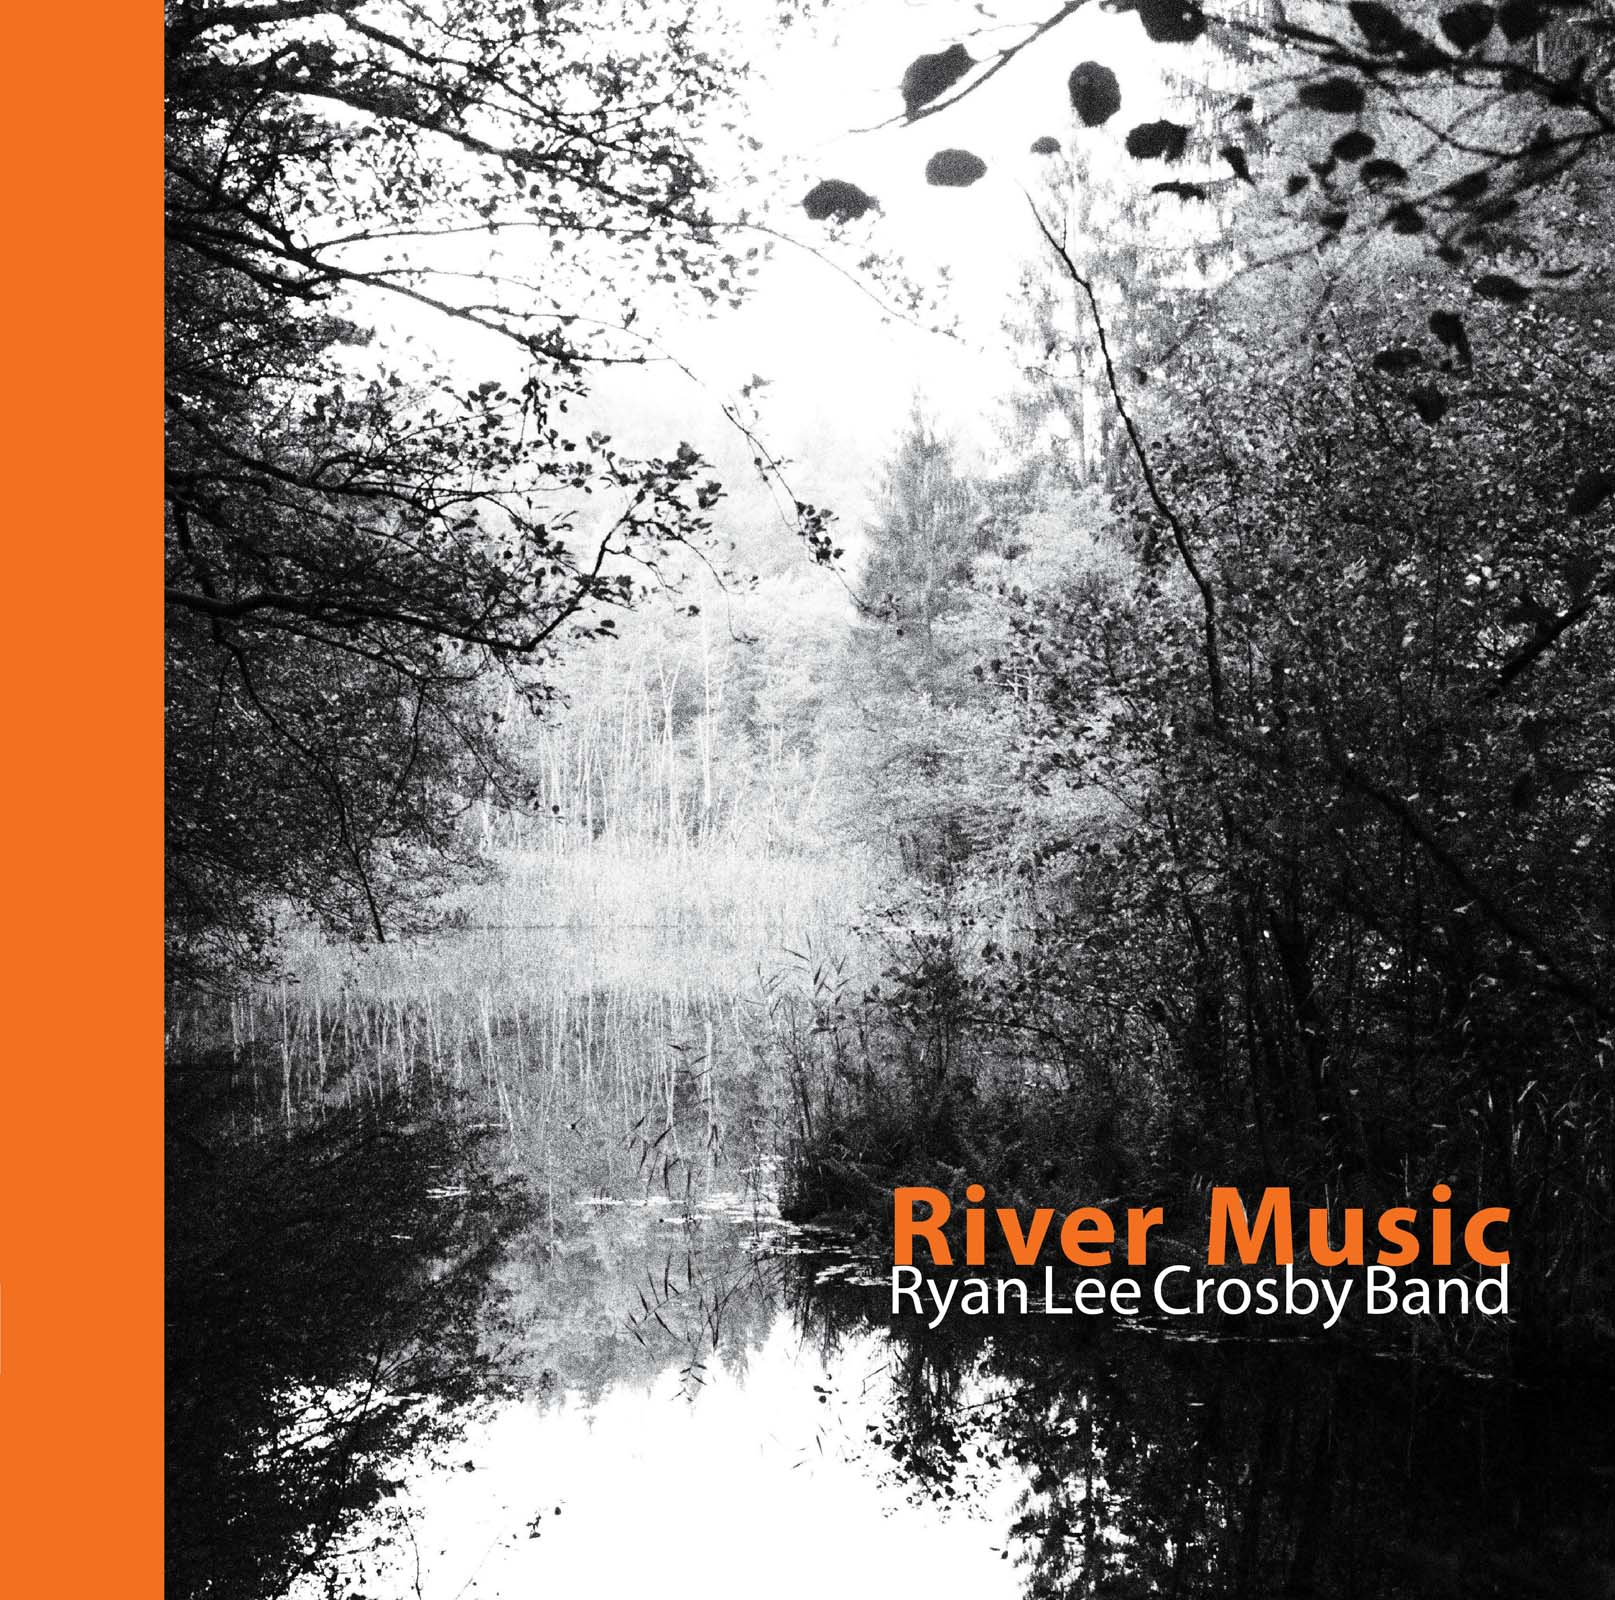 River Music LP